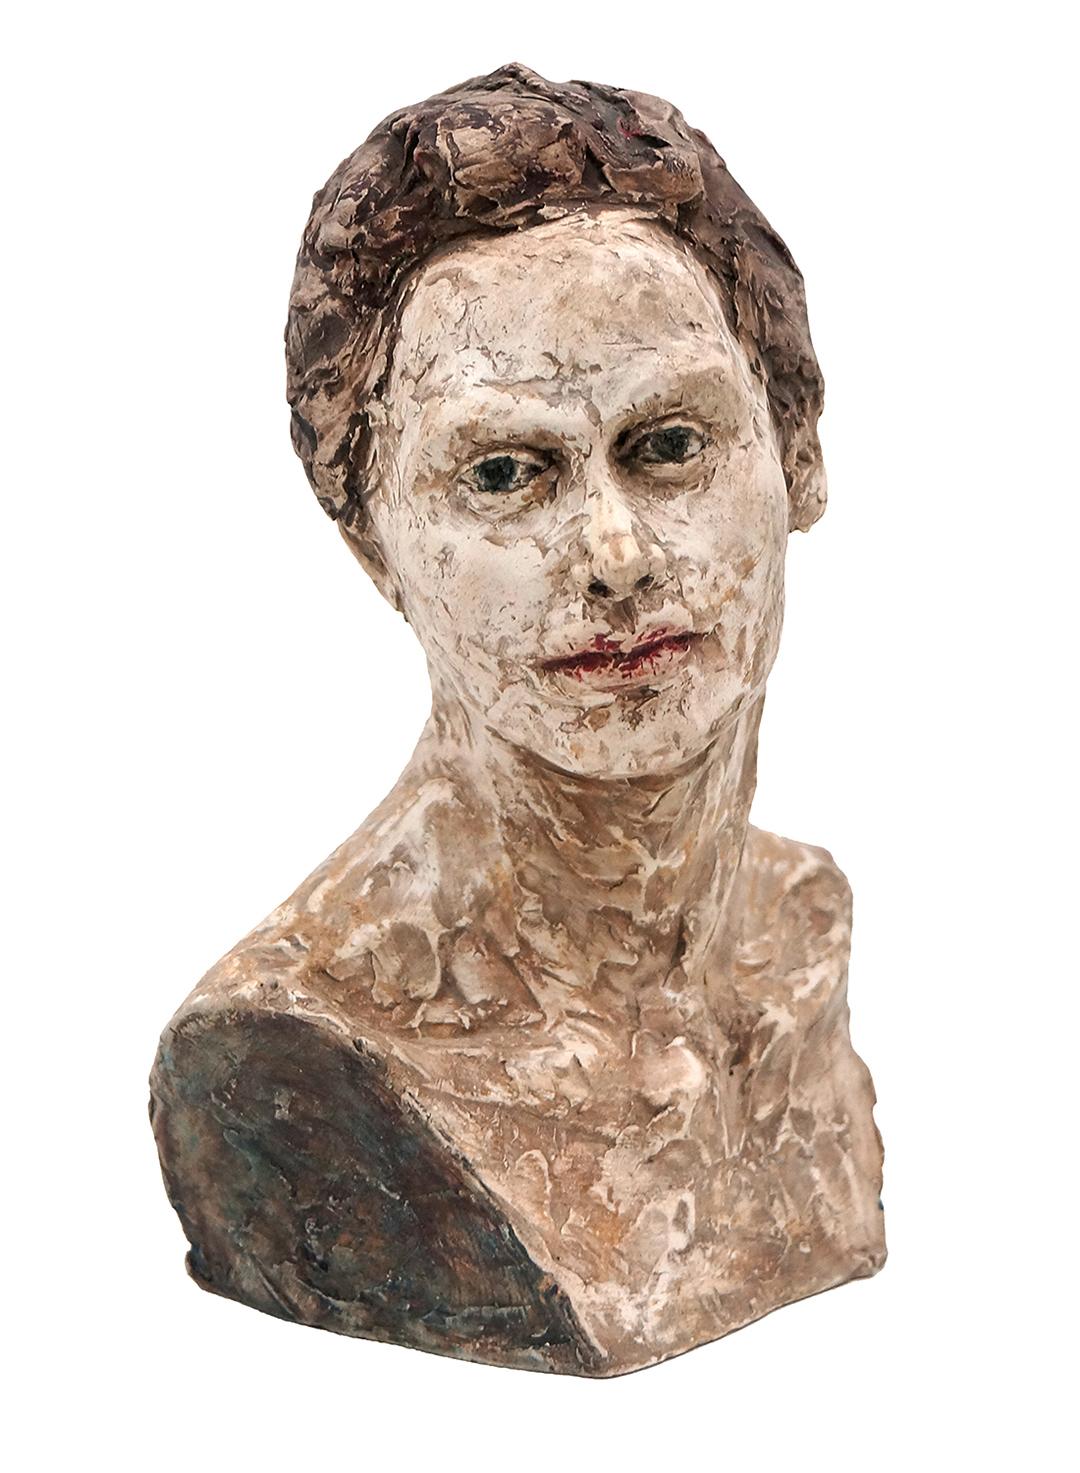 Small portrait of a girl Jess Miller Fired clay sculpture , 23cm x 16cm x 10cm, 2016